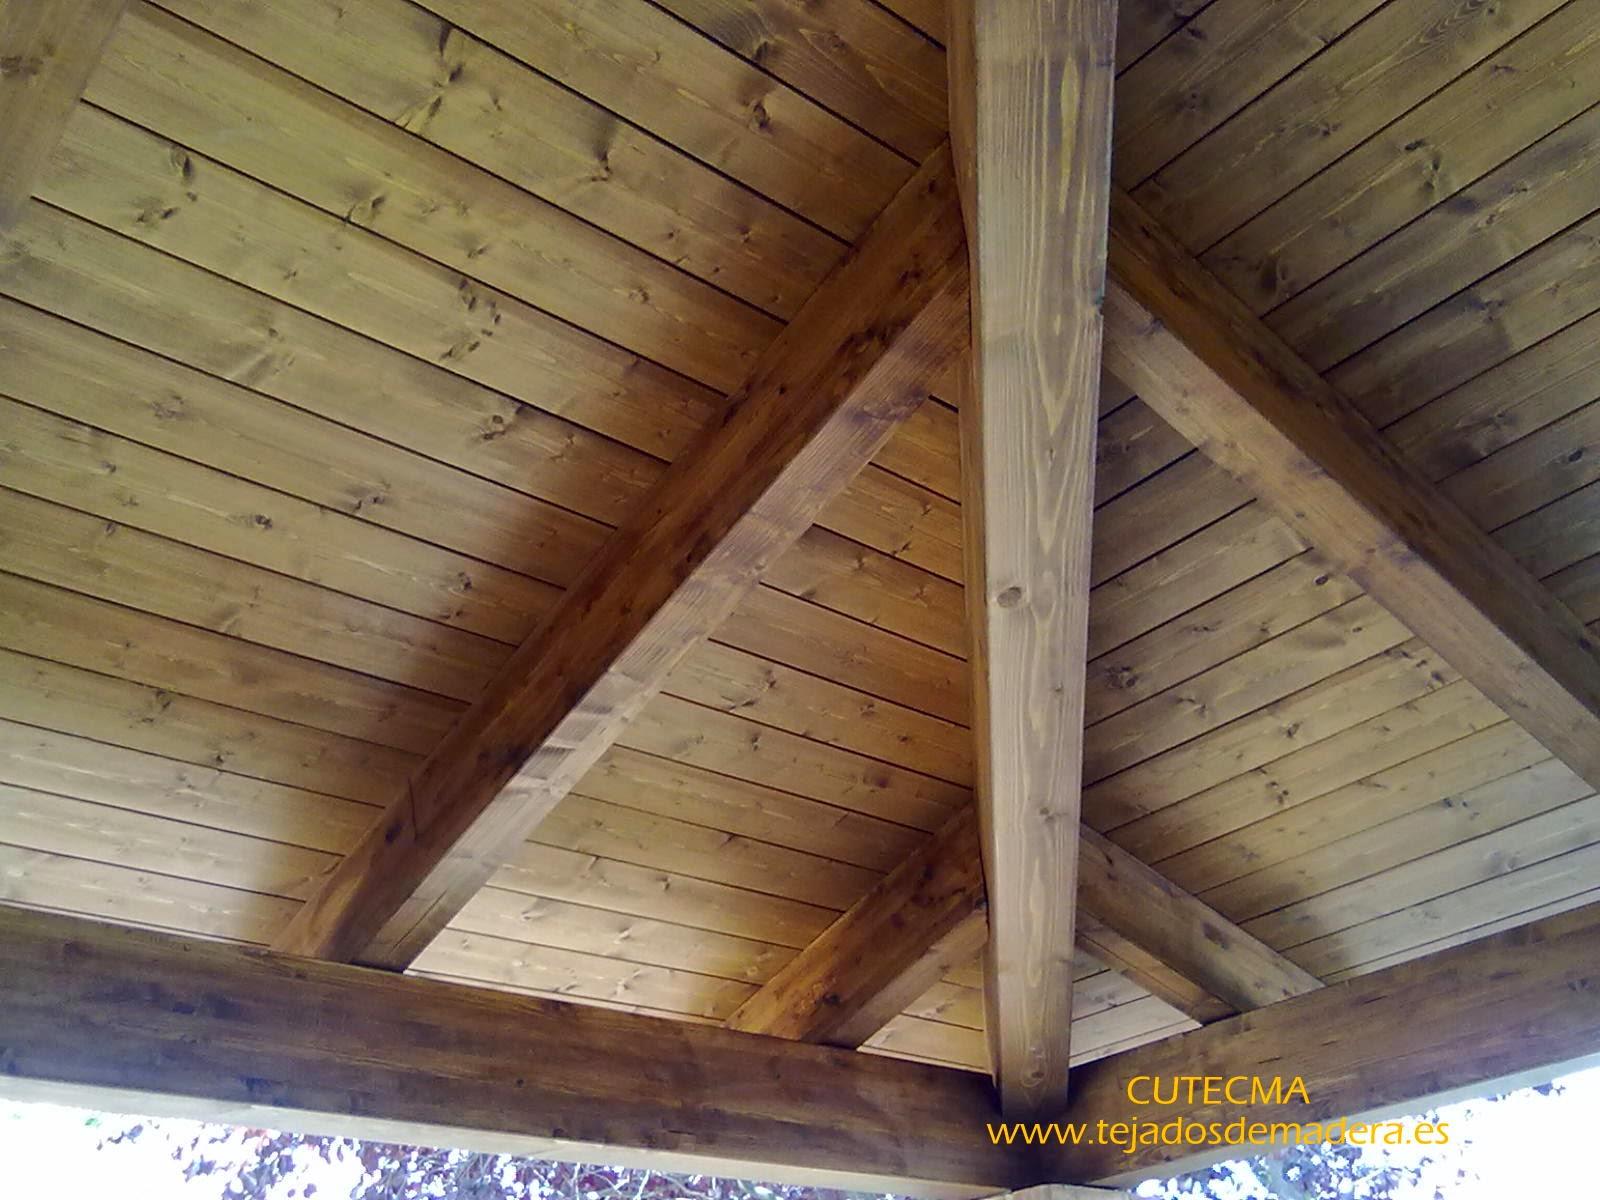 Porche de madera - www.tejadosdemadera.es